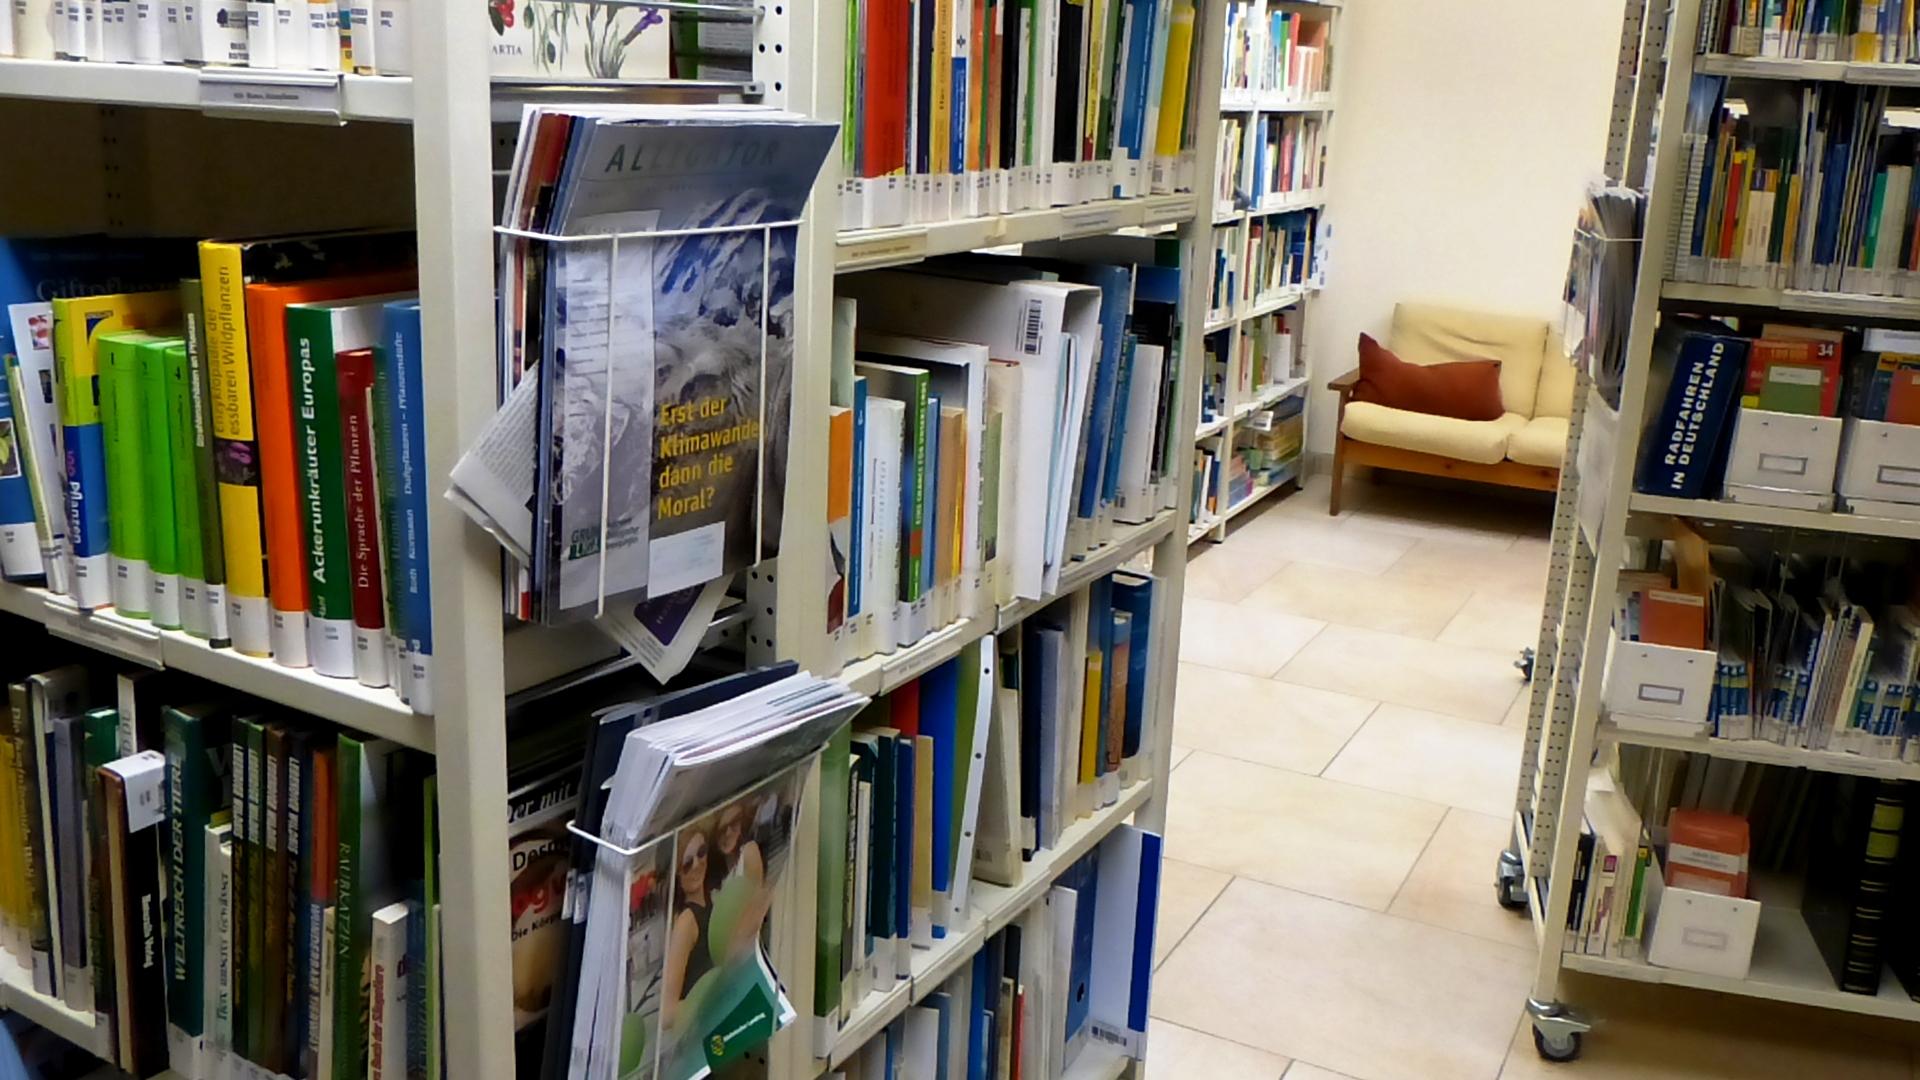 http://www.umweltbibliothek-dresden.bbopac.de/public/img/64/Regale%20f%C3%BCr%20Opac.JPG